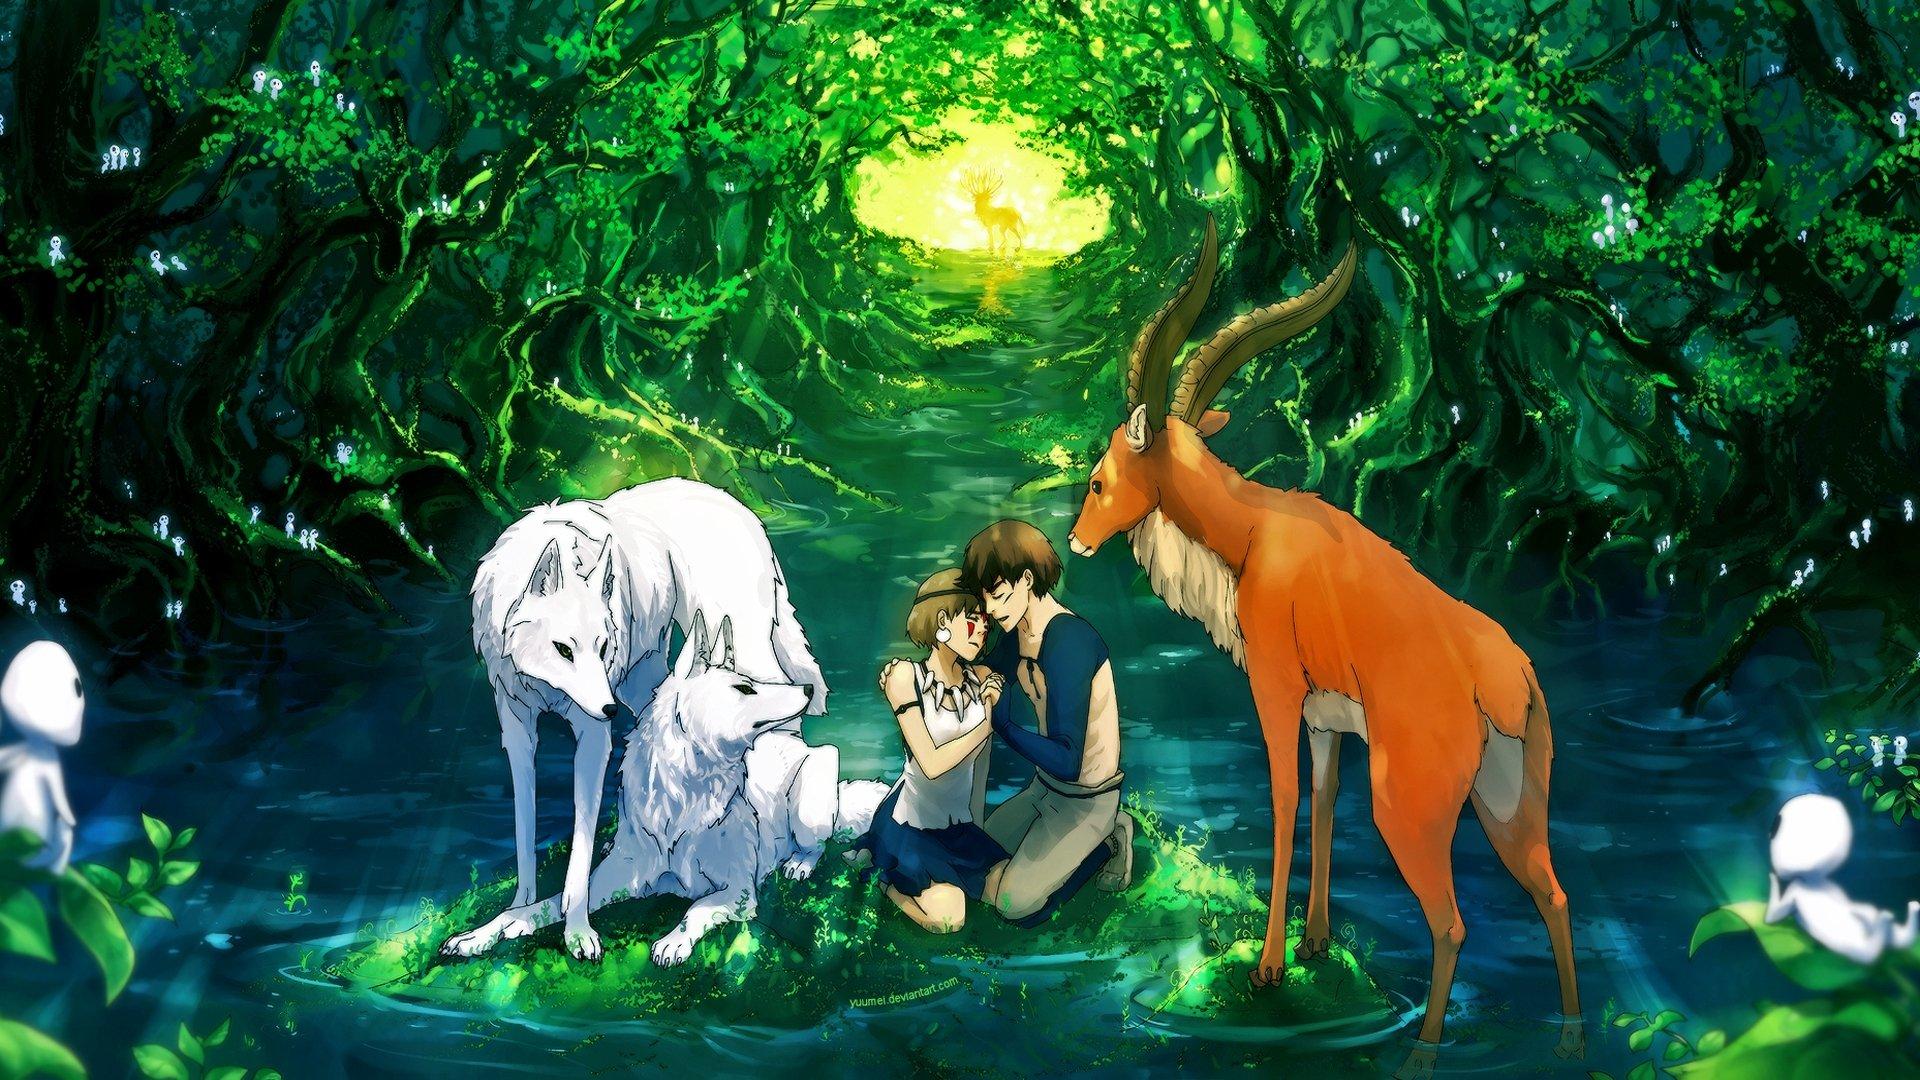 Fondos De Animales Animados: Anime Girl Character Beautiful Animal Forest Deer Couple